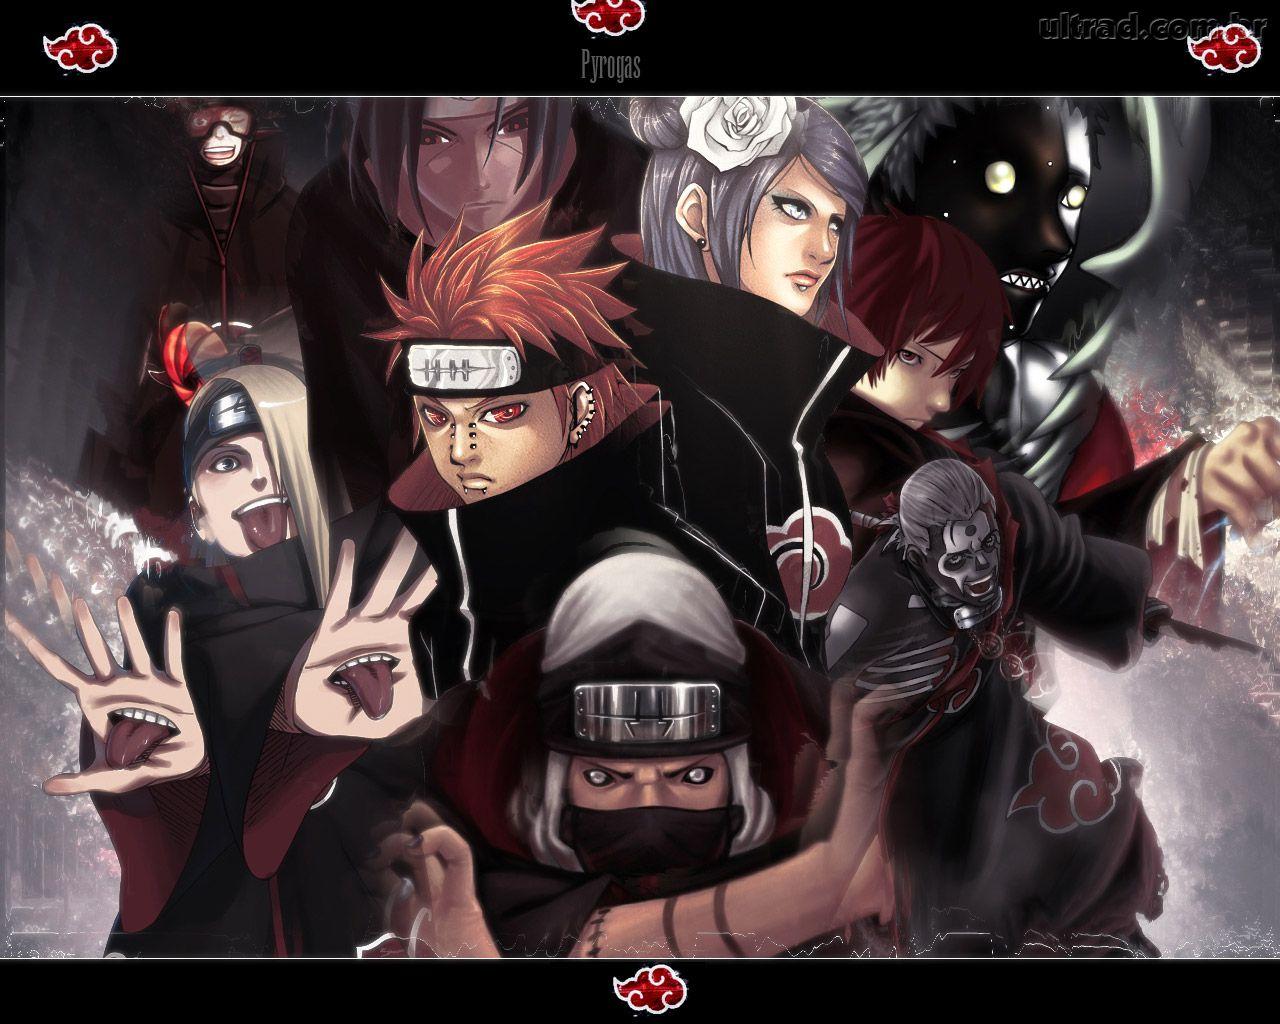 Como colocar papel de parede do Naruto que move as imagens